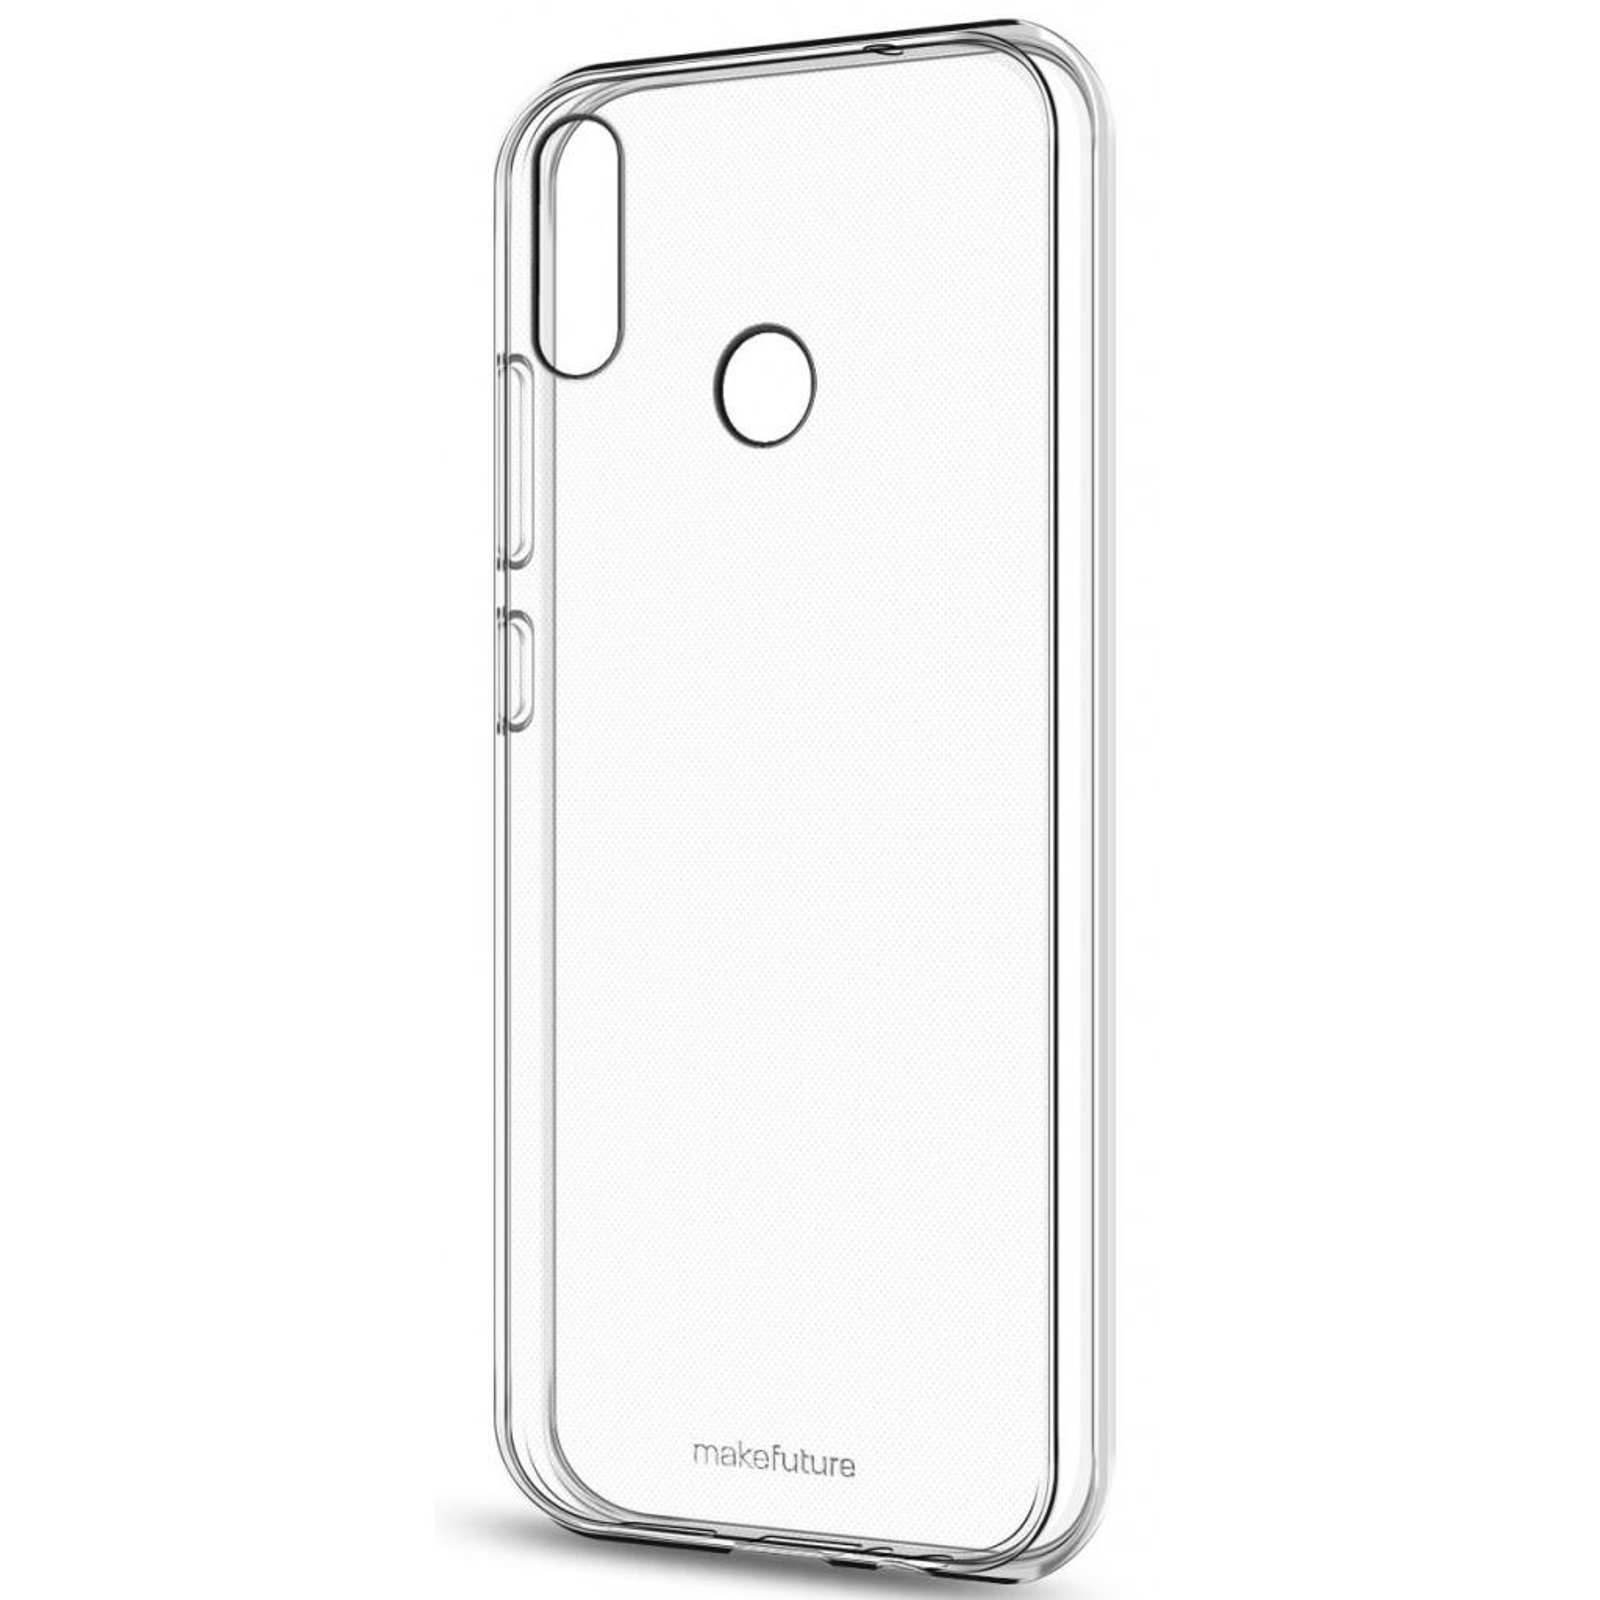 Чехол для моб. телефона MakeFuture Air Case (TPU) Honor 8X Clear (MCA-H8XCL)